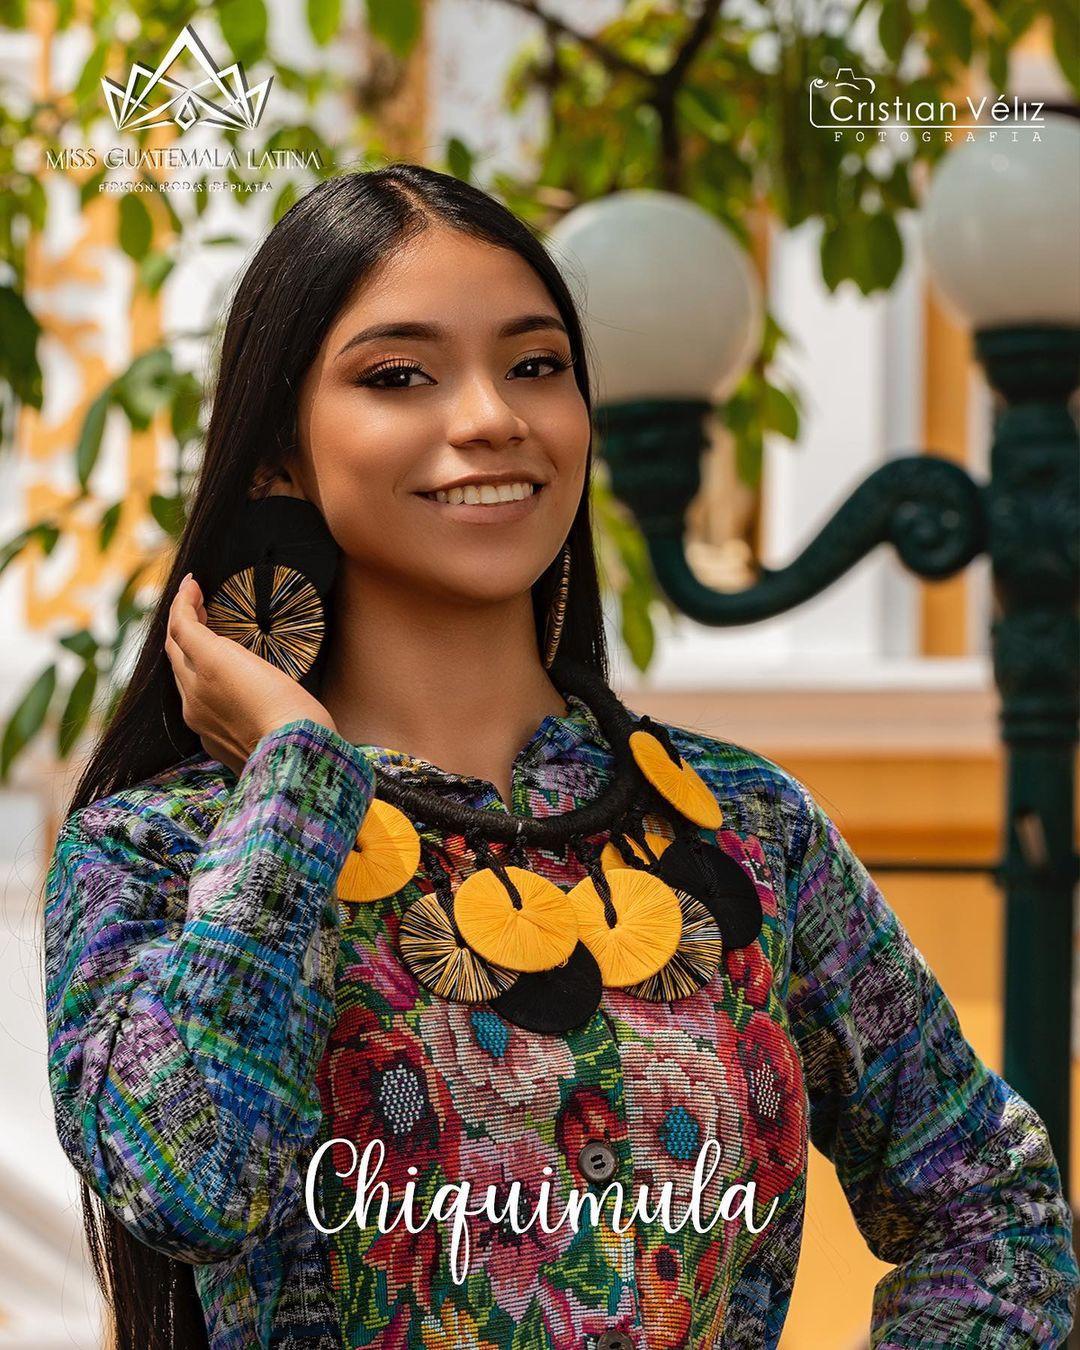 candidatas a miss guatemala latina 2021. final: 30 de abril. - Página 3 B2rxTP